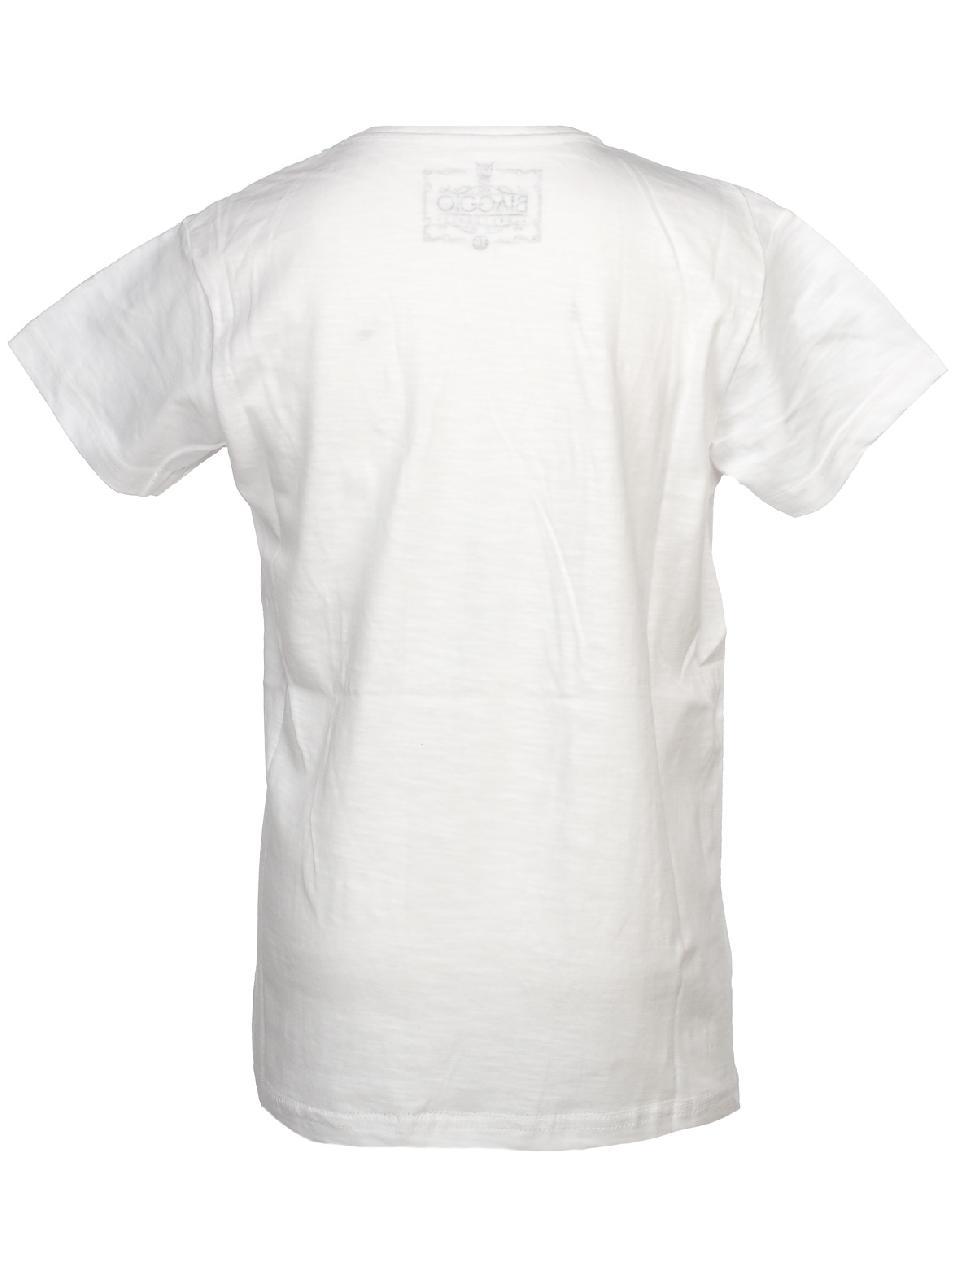 Tee-shirt-manches-courtes-Biaggio-Lorikel-blanc-mc-tee-jr-Blanc-58544-Neuf